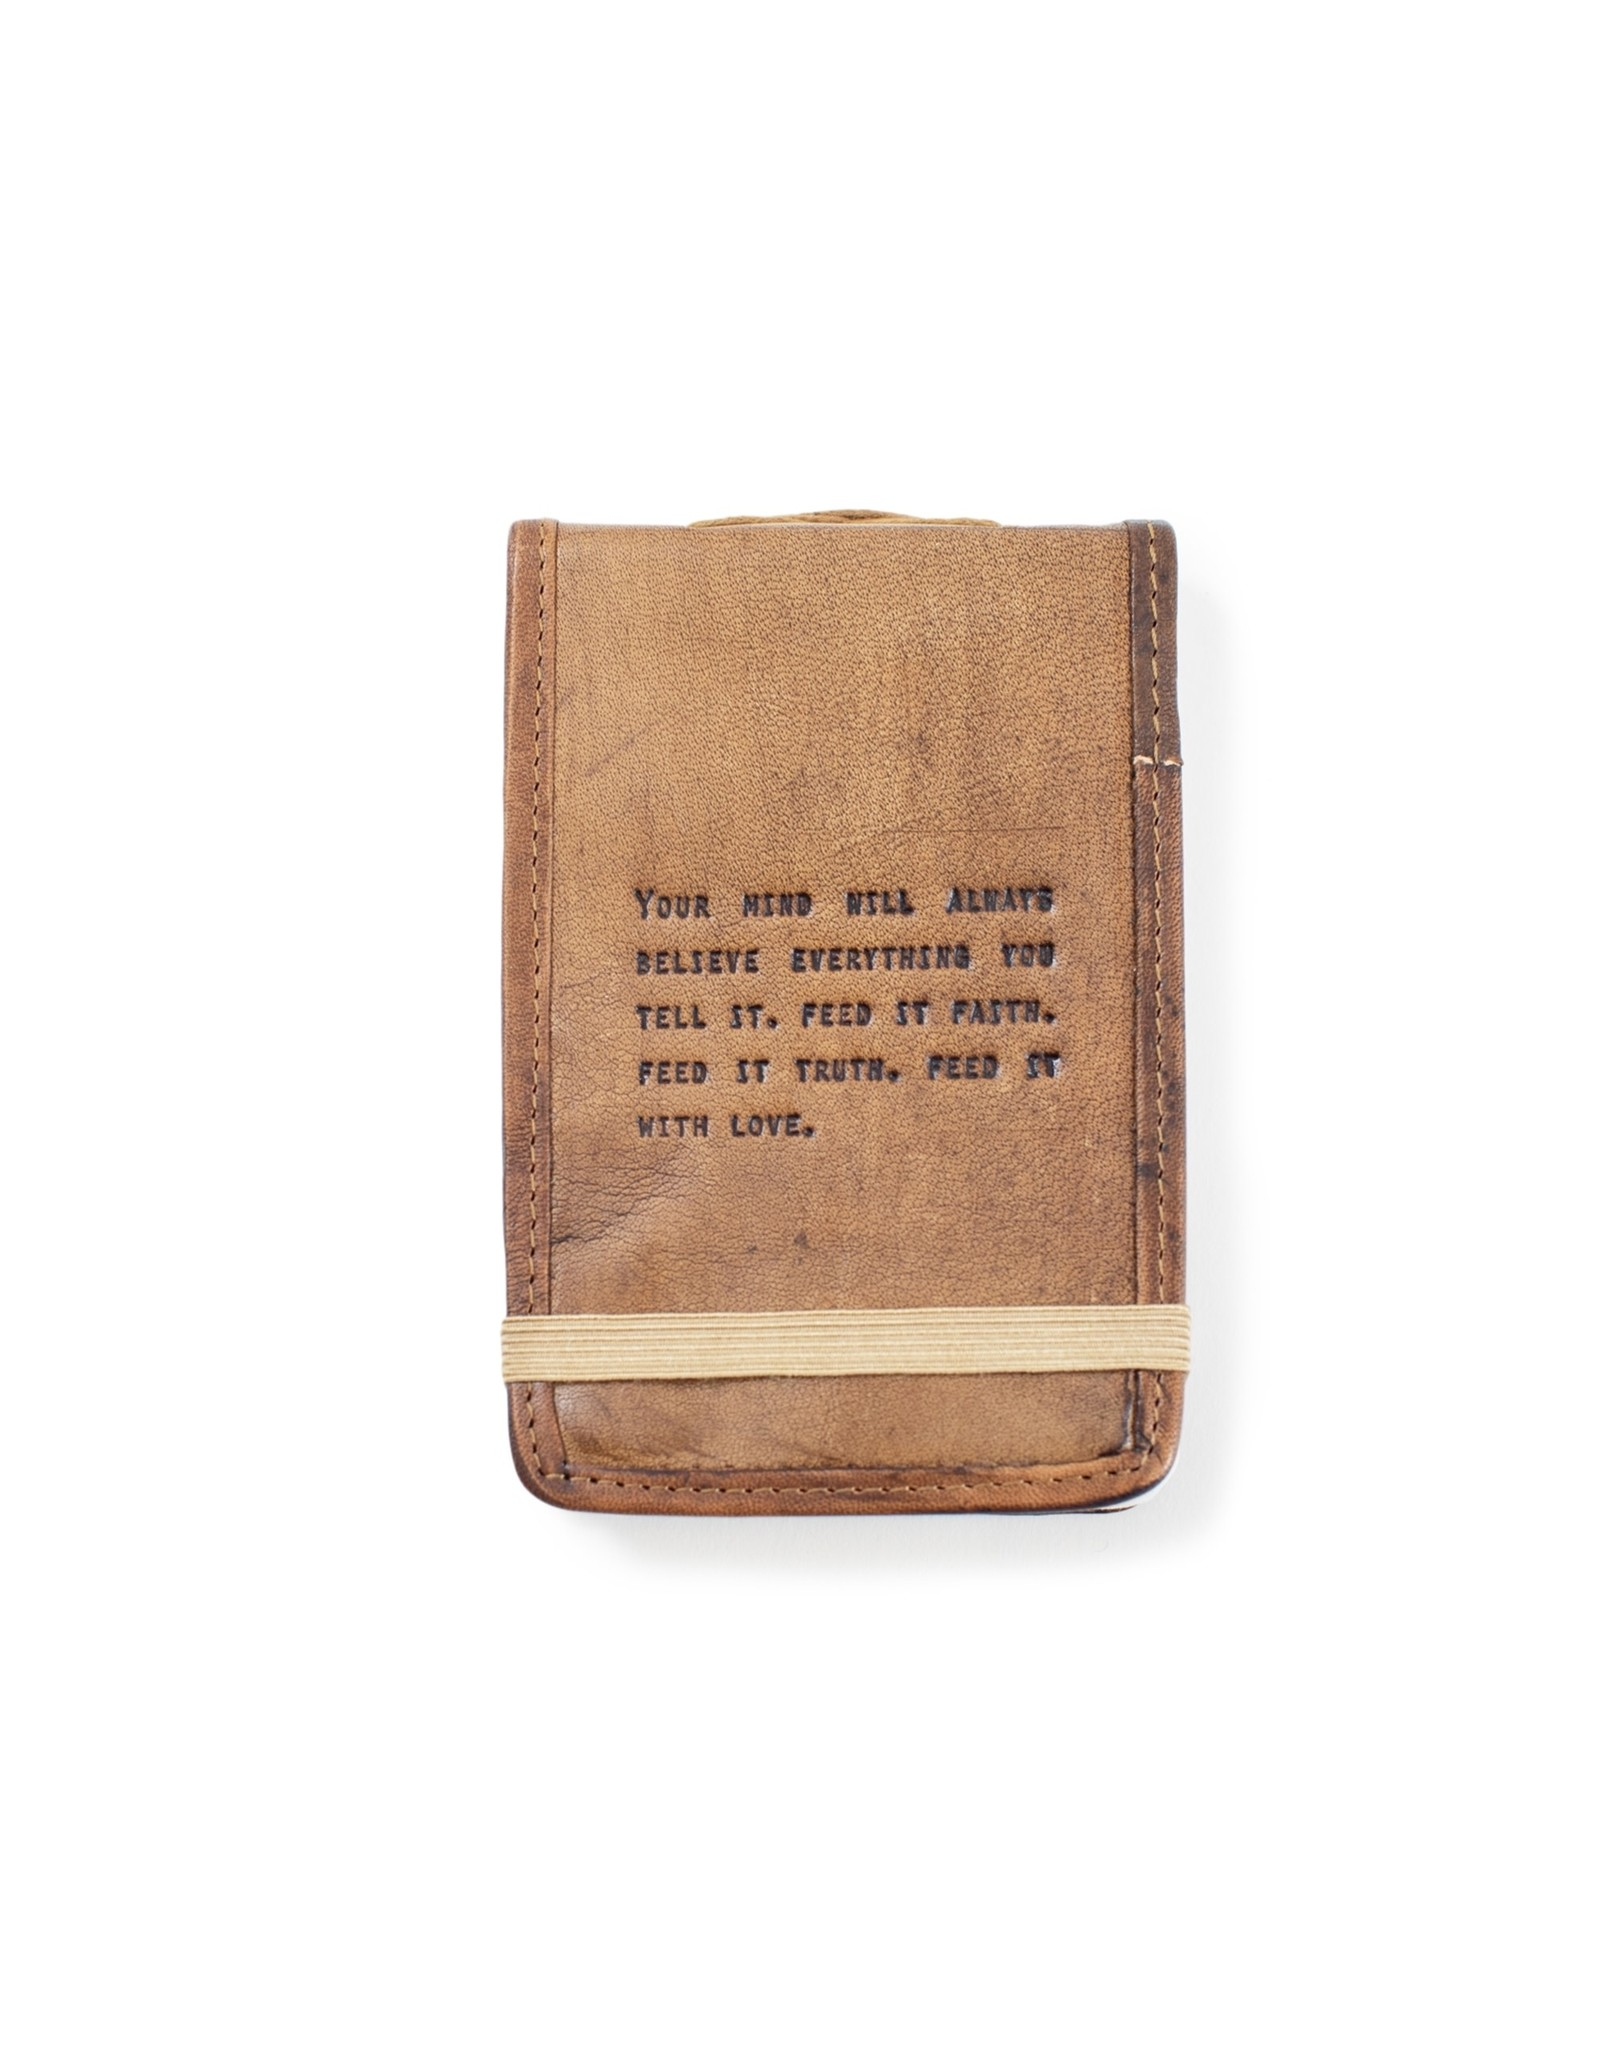 Sugarboo & Co Leather Mini Journal